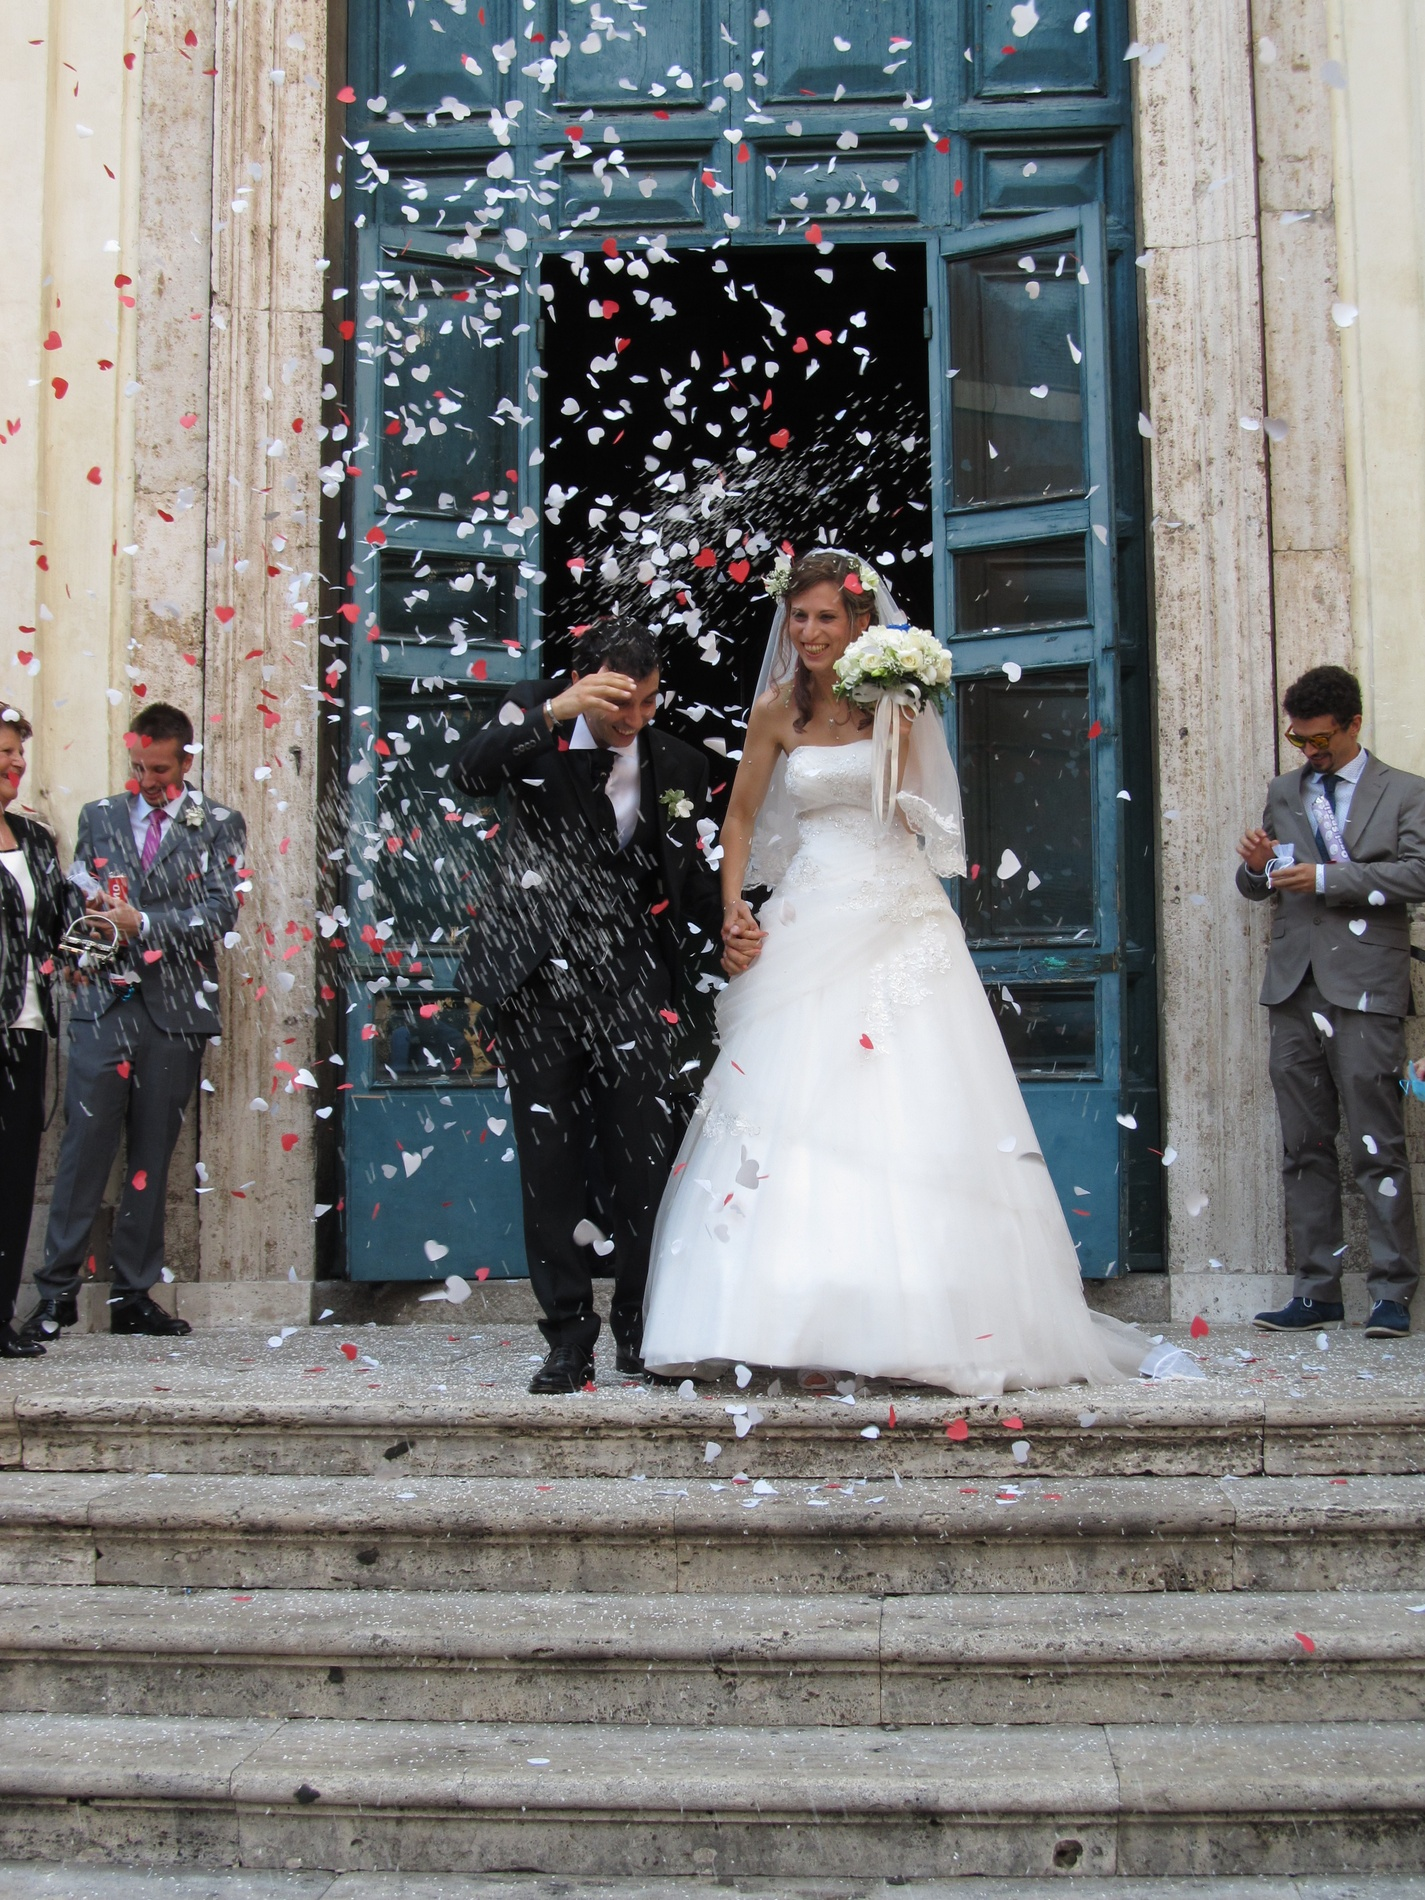 matrimonio-ilaria-torrisi-e-marco-di-lucia-2015-08-08-16-52-32